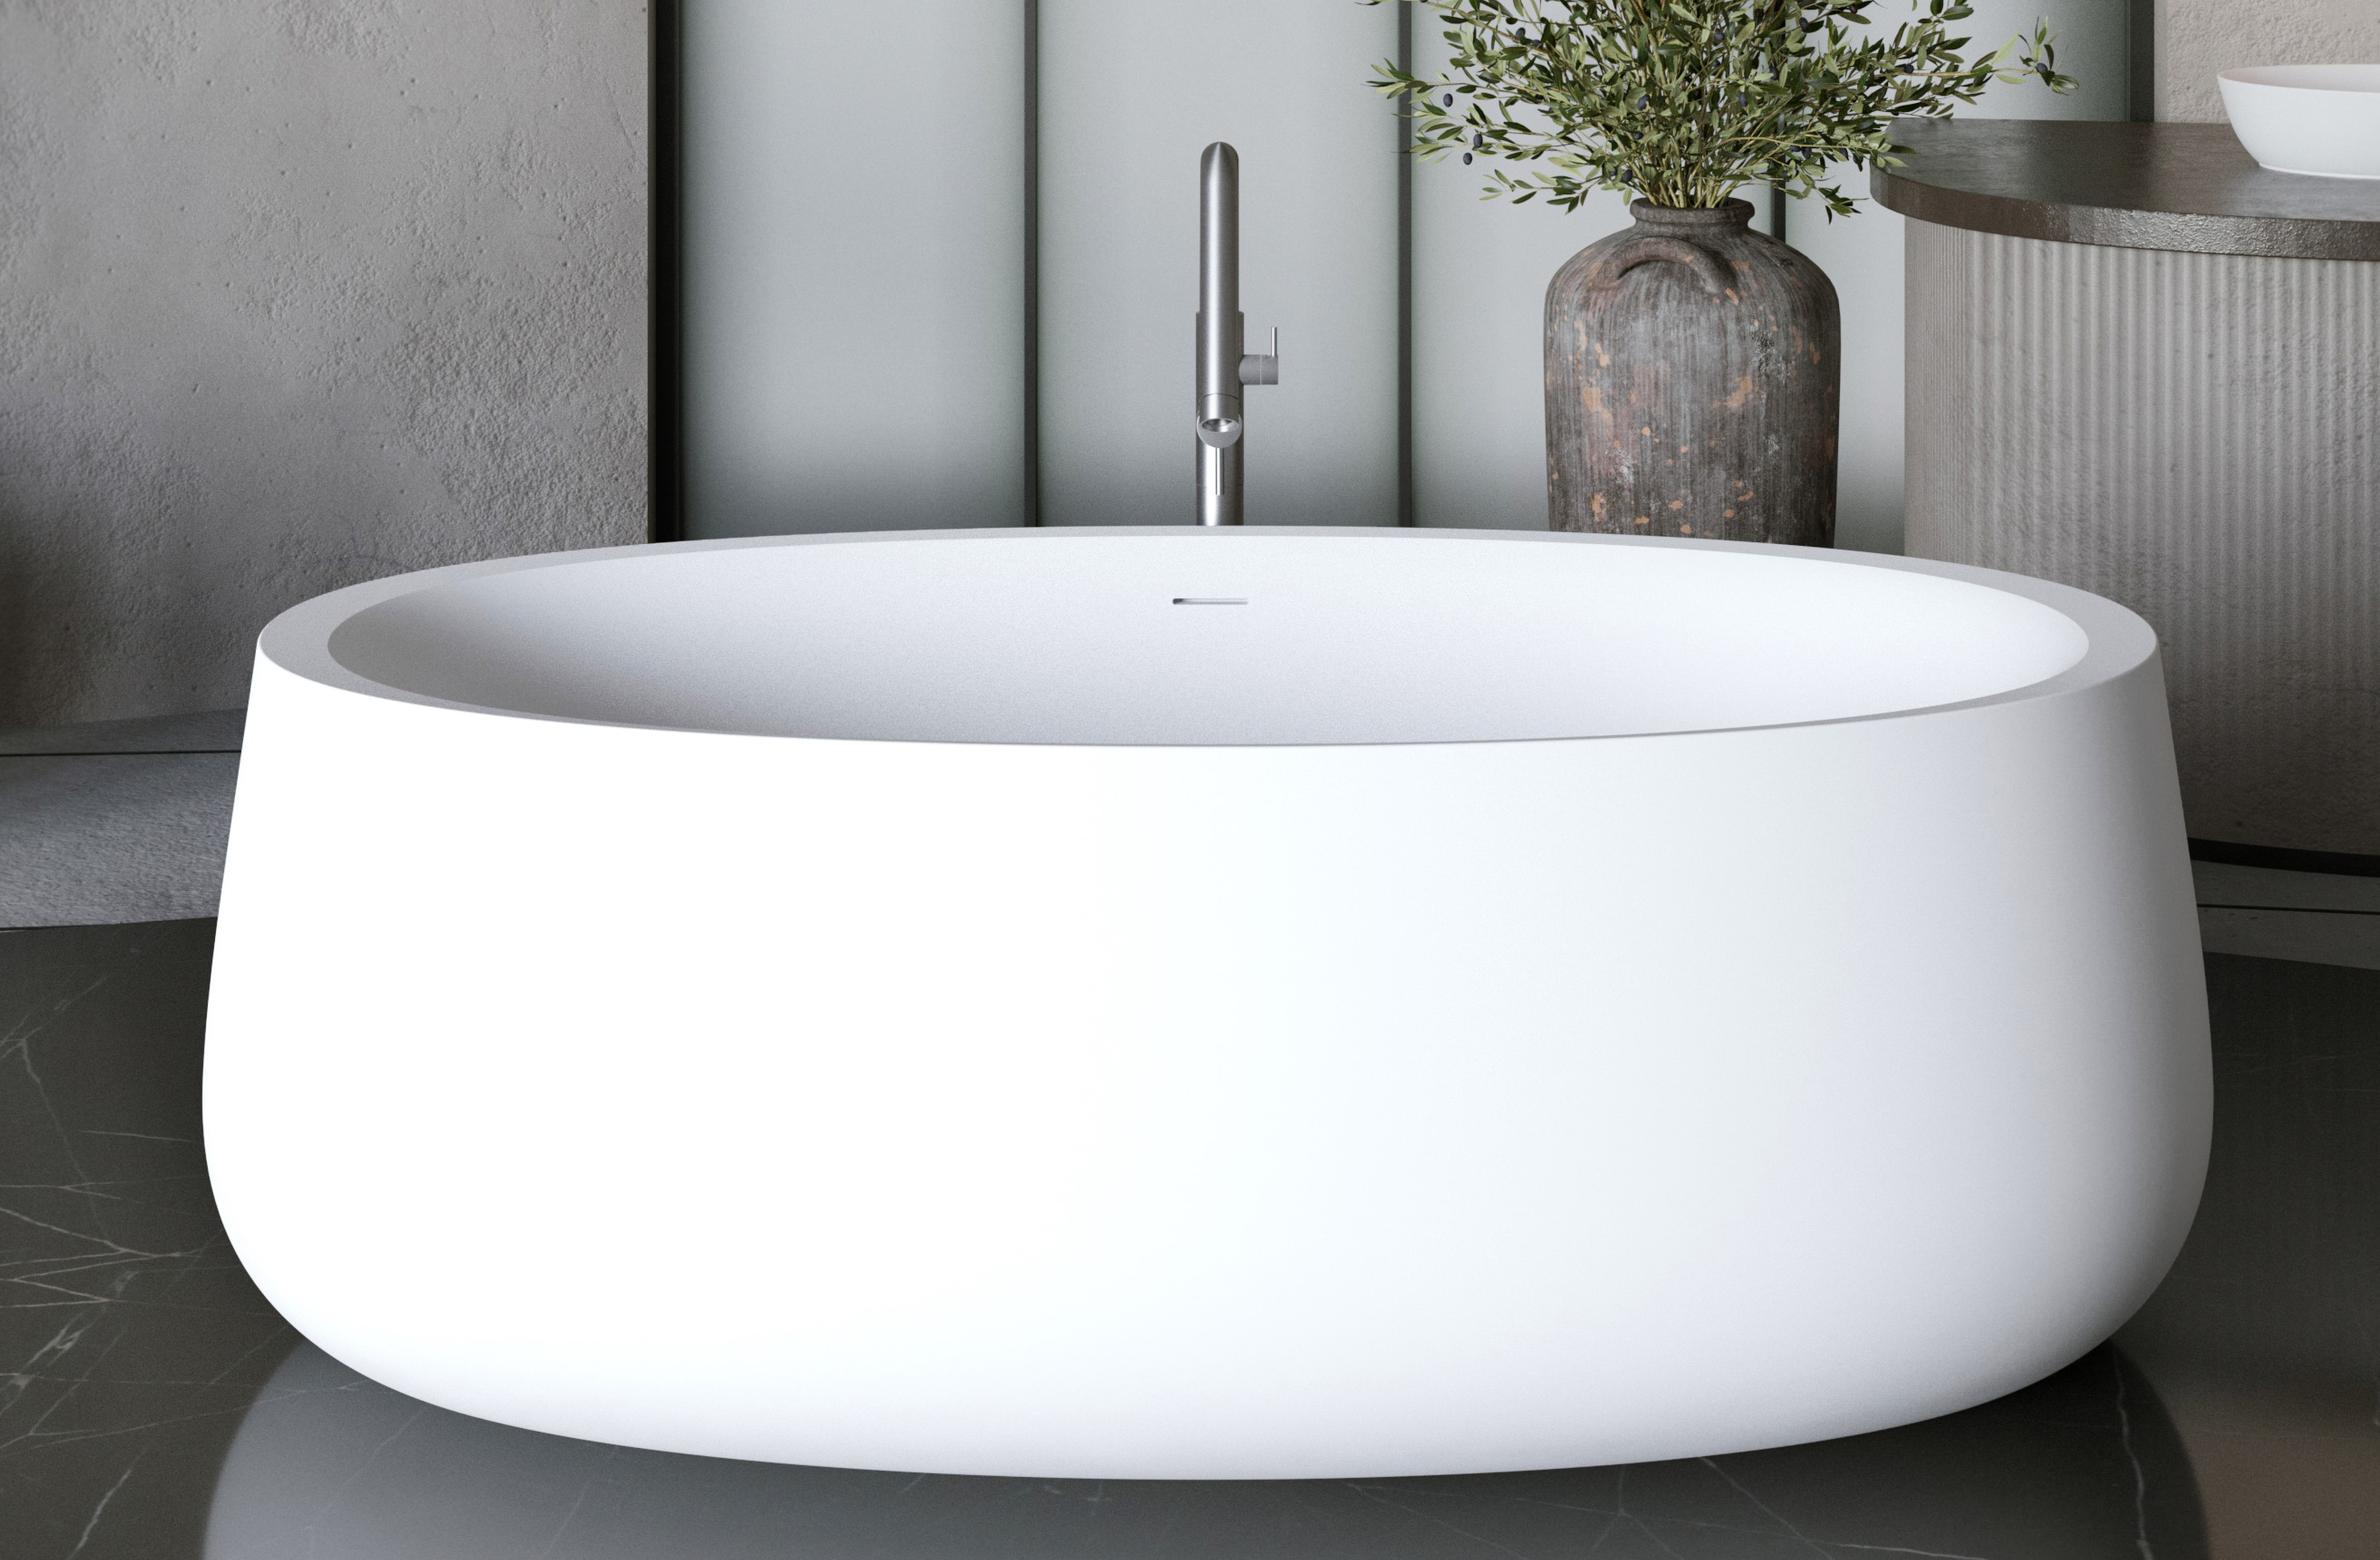 Aquatica Leah Freestanding Solid Surface Bathtub Snippet01